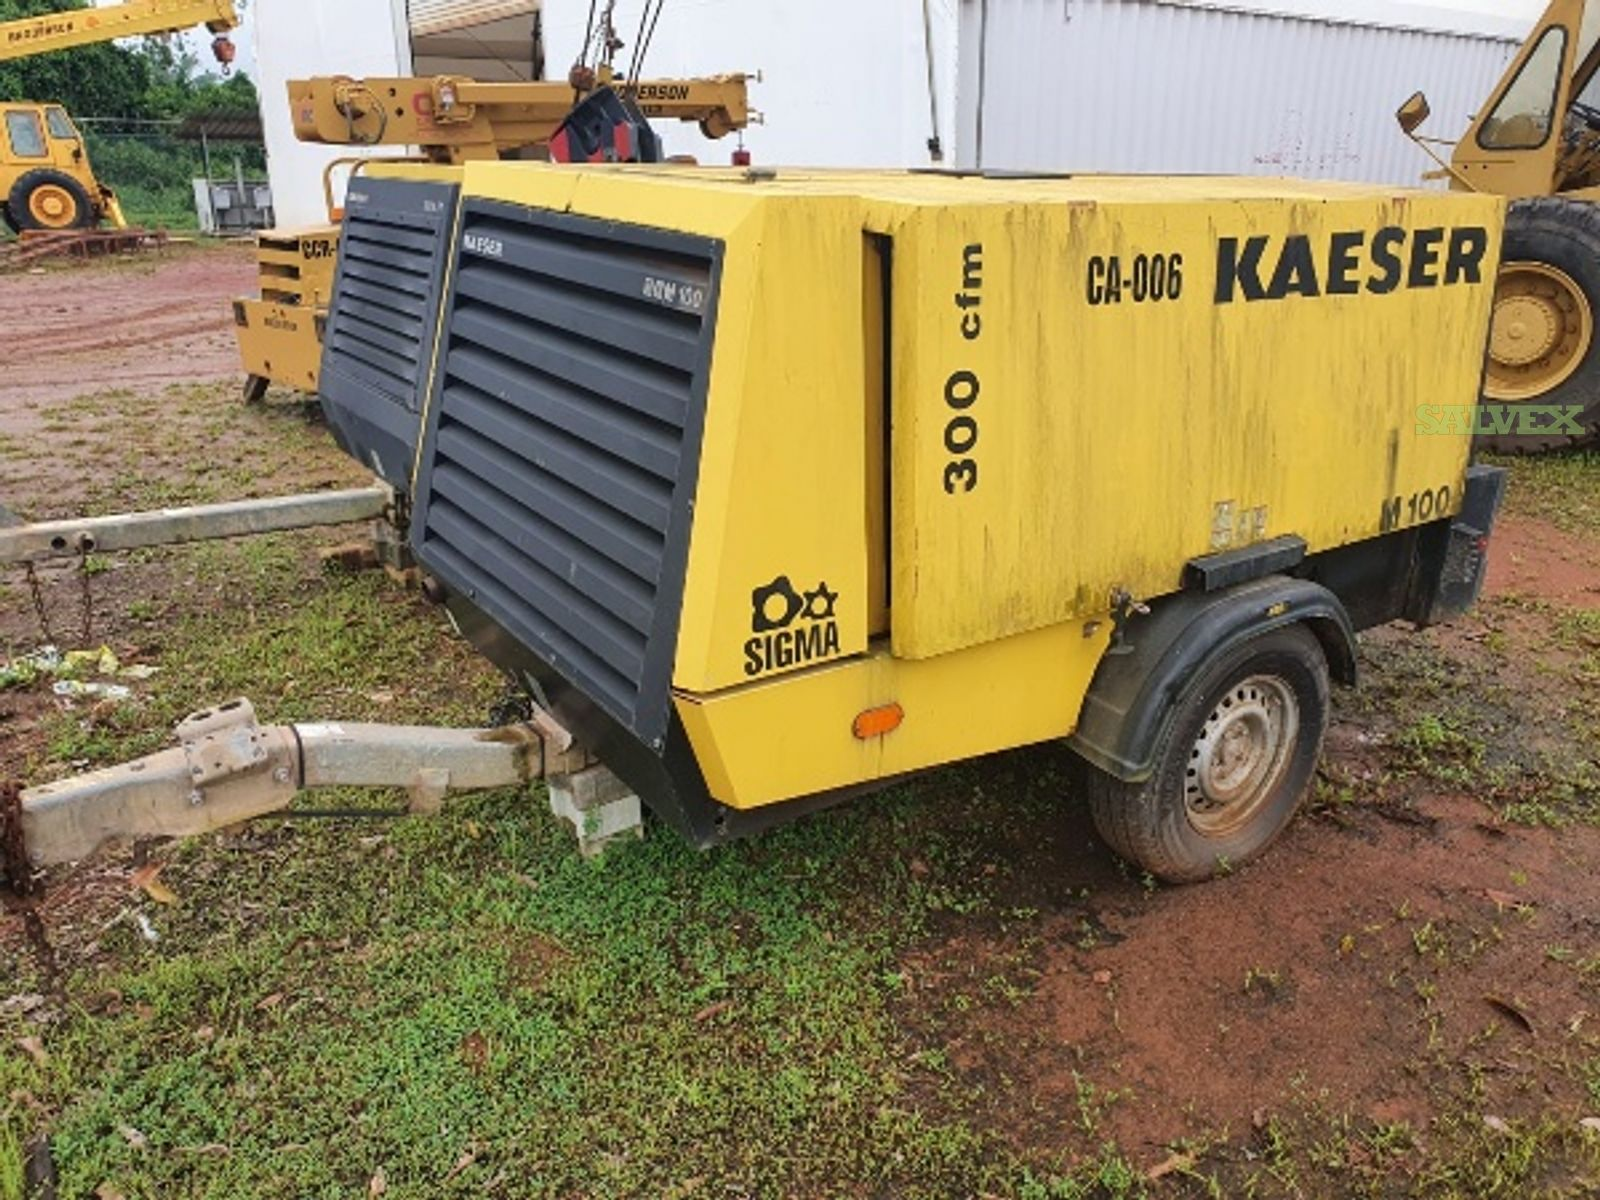 Kaeser Compressors (2 Units)